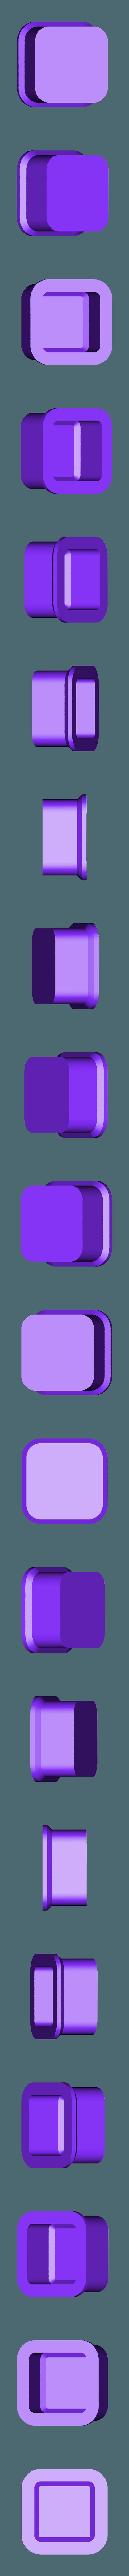 VA_Meter_Case_v2-0_BUTTON.STL Download free STL file Voltmeter/Ammeter Case - 2 • 3D print object, WalterHsiao